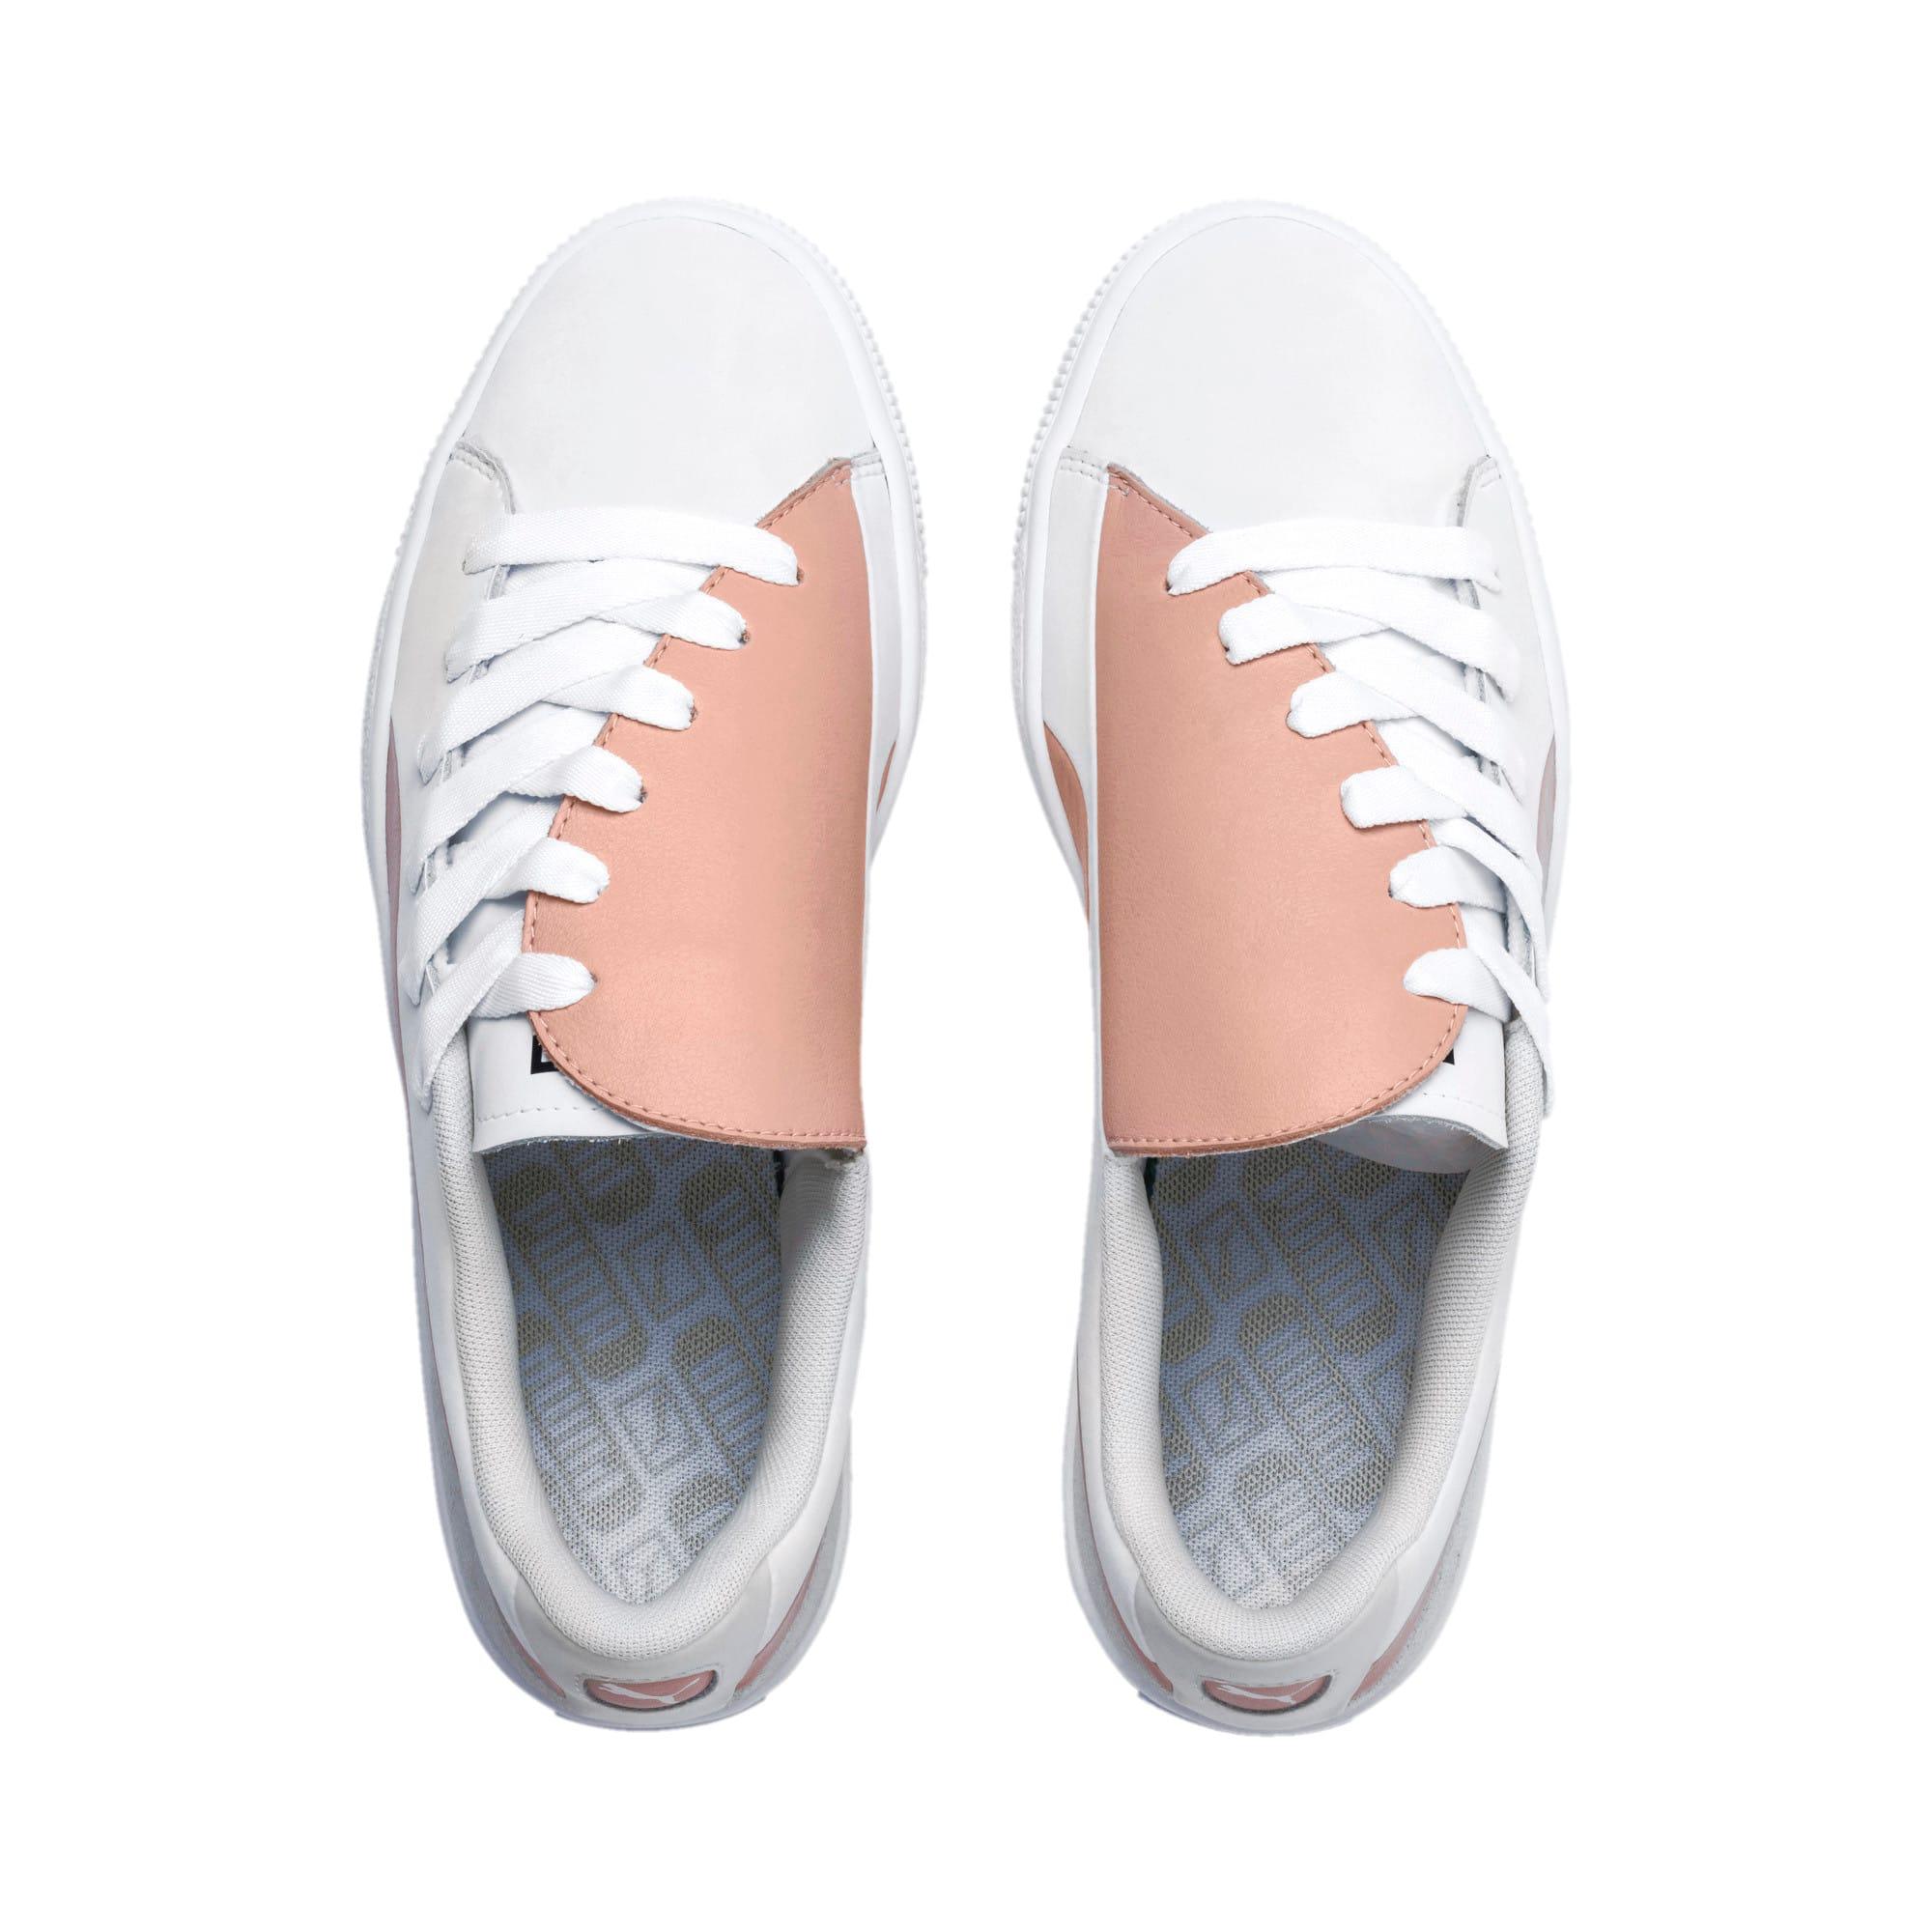 Thumbnail 7 of Basket Crush Paris Women's Sneakers, Peach Beige-Puma White, medium